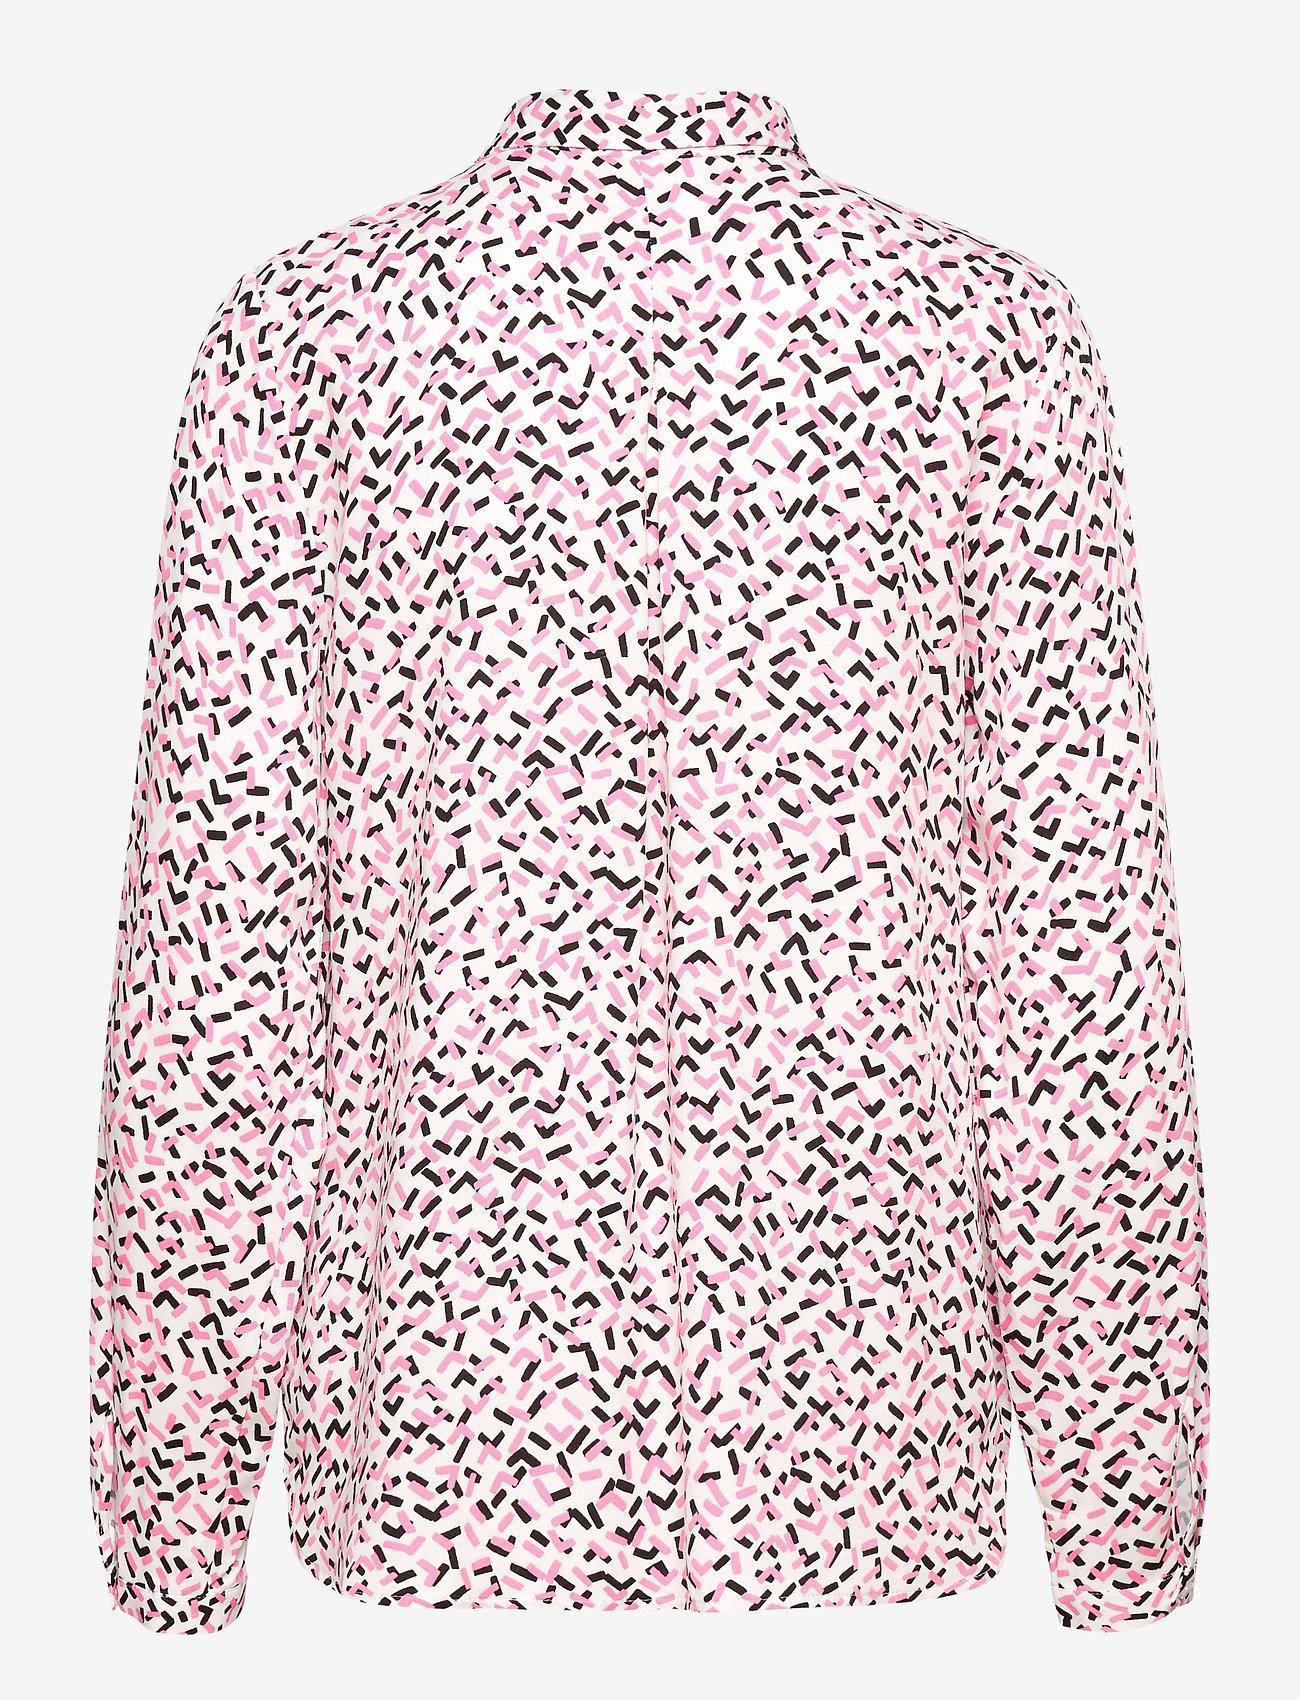 Nanso - Ladies blouse, Pätkät - overhemden met lange mouwen - pink - 1